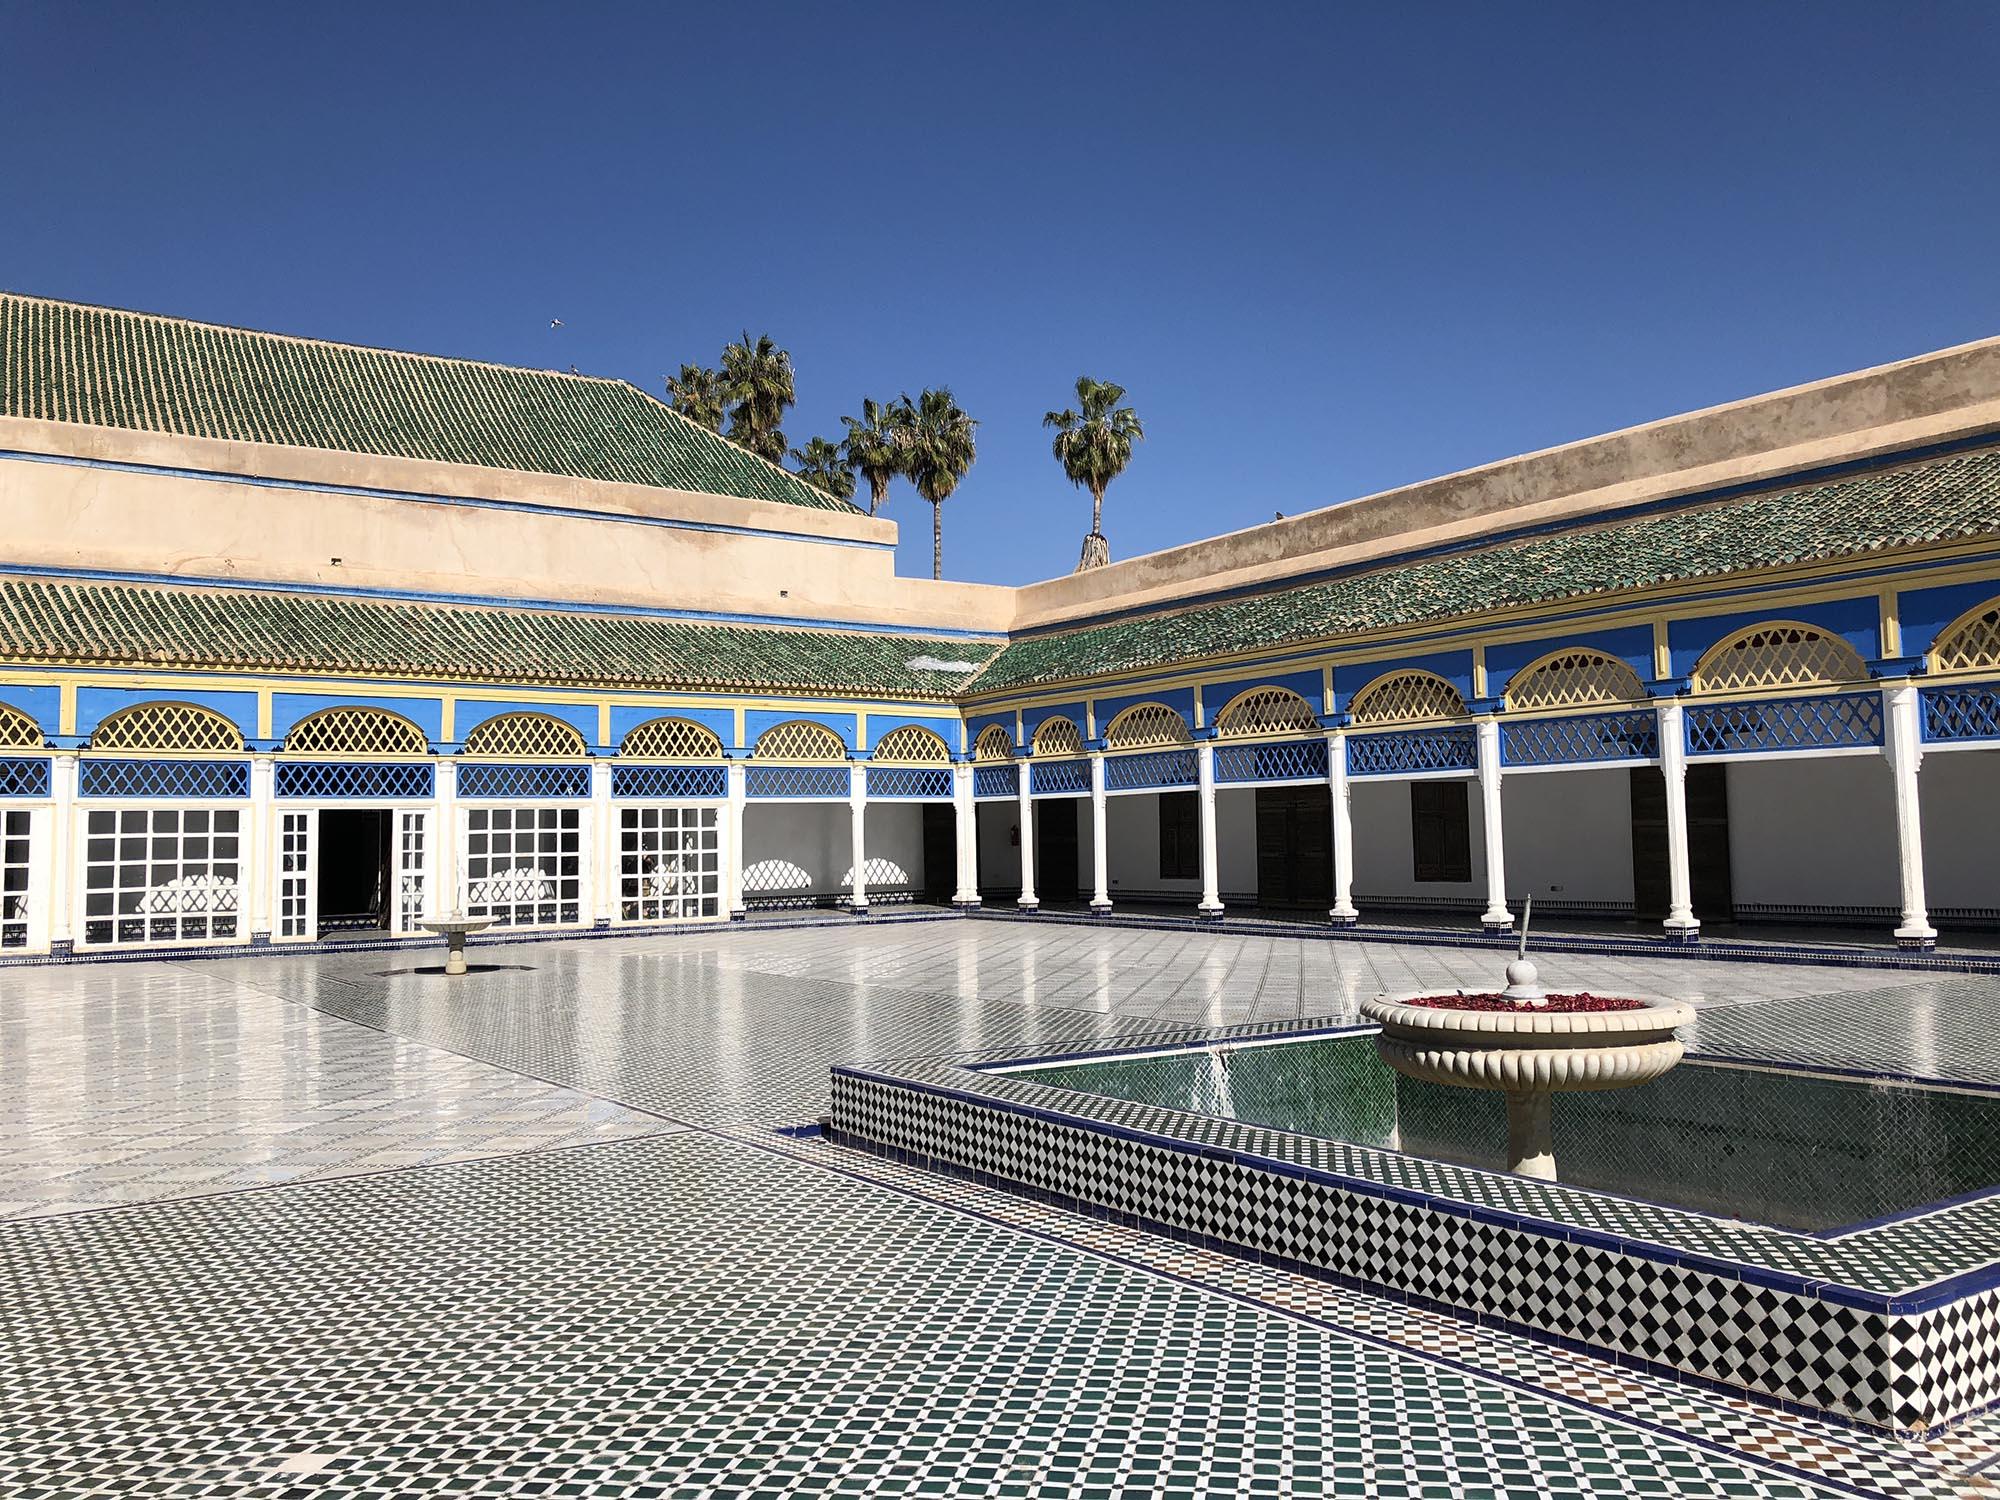 Marrakech Bahiapaleis